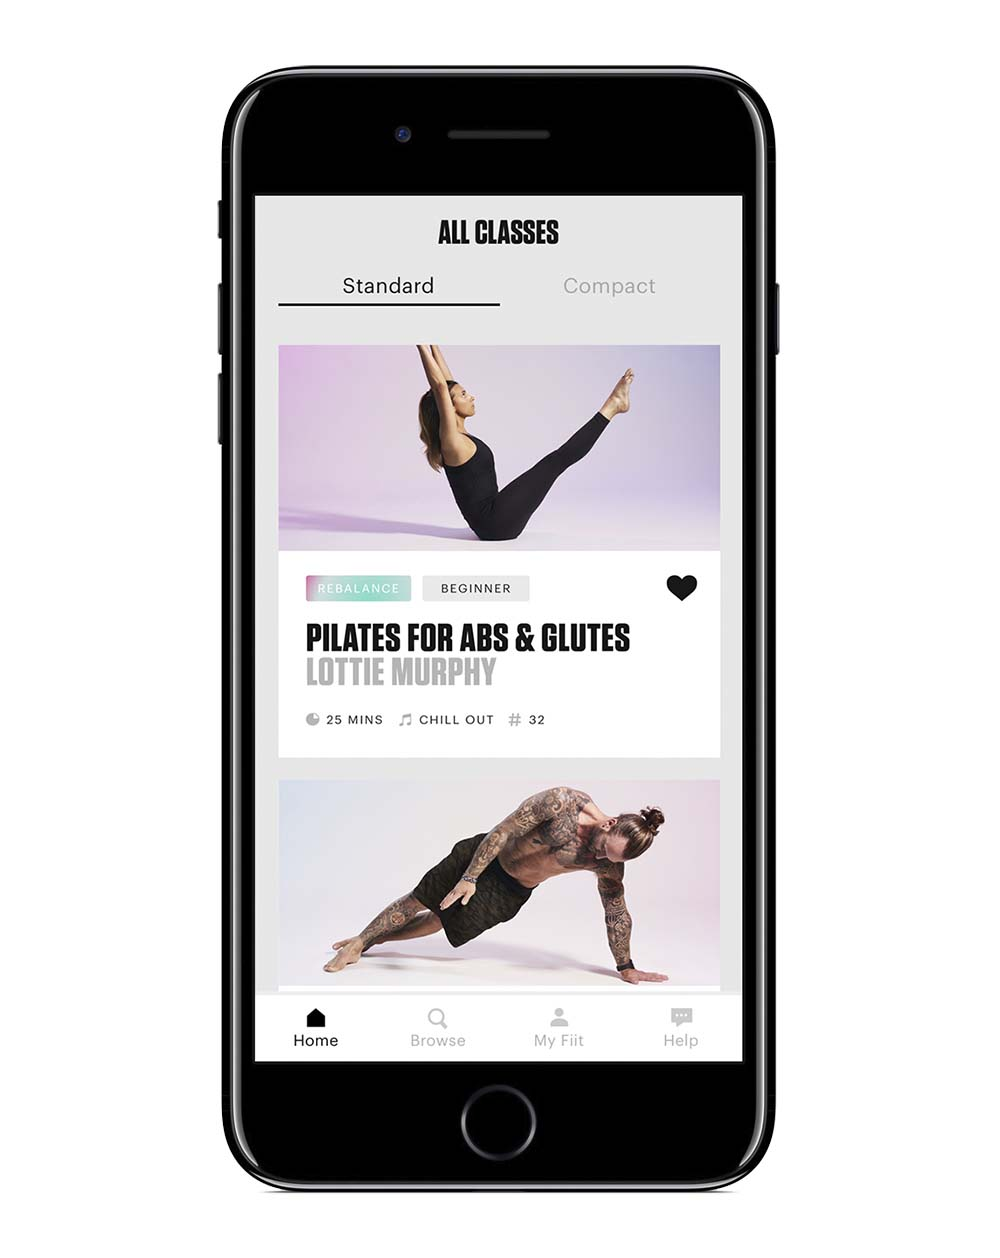 fiit phone app xmas gift guide